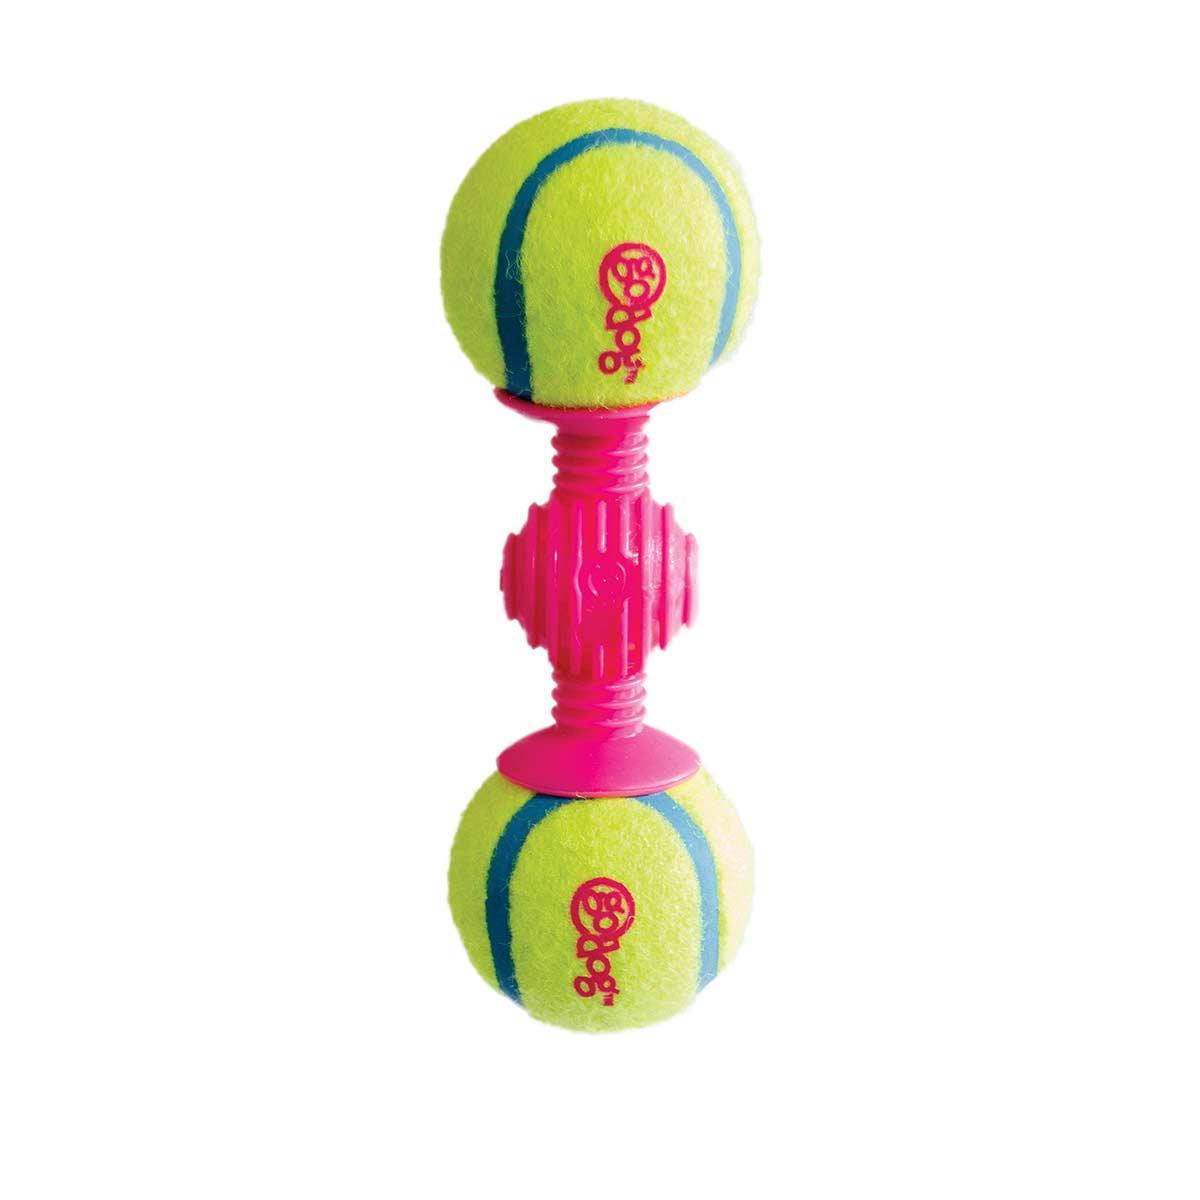 goDog Retrieval goBone Small Toy for Fetch